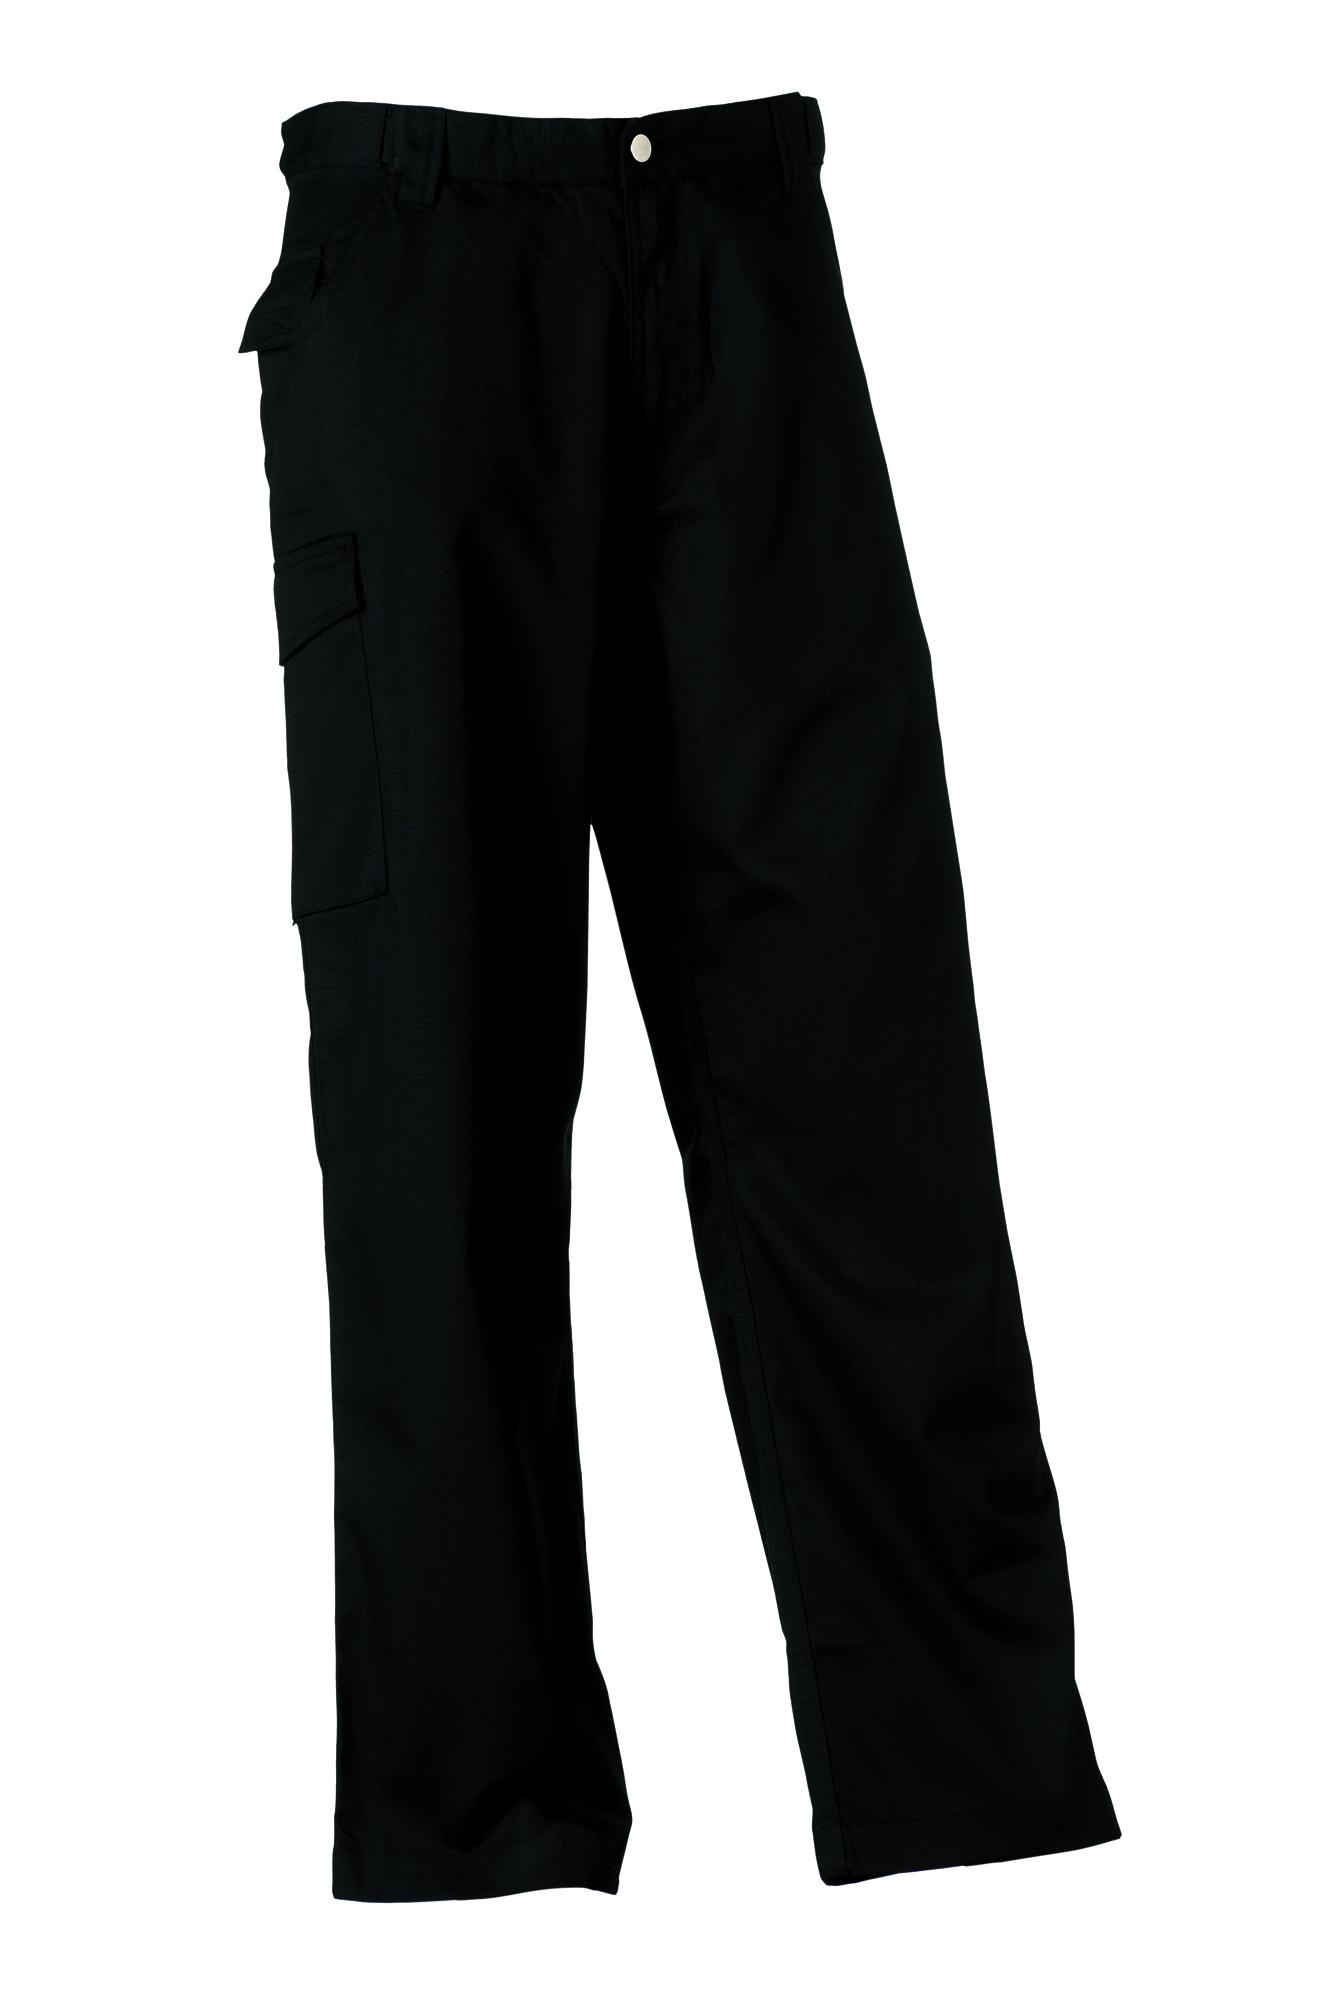 Polycotton Twill Trousers - Black - 28-32